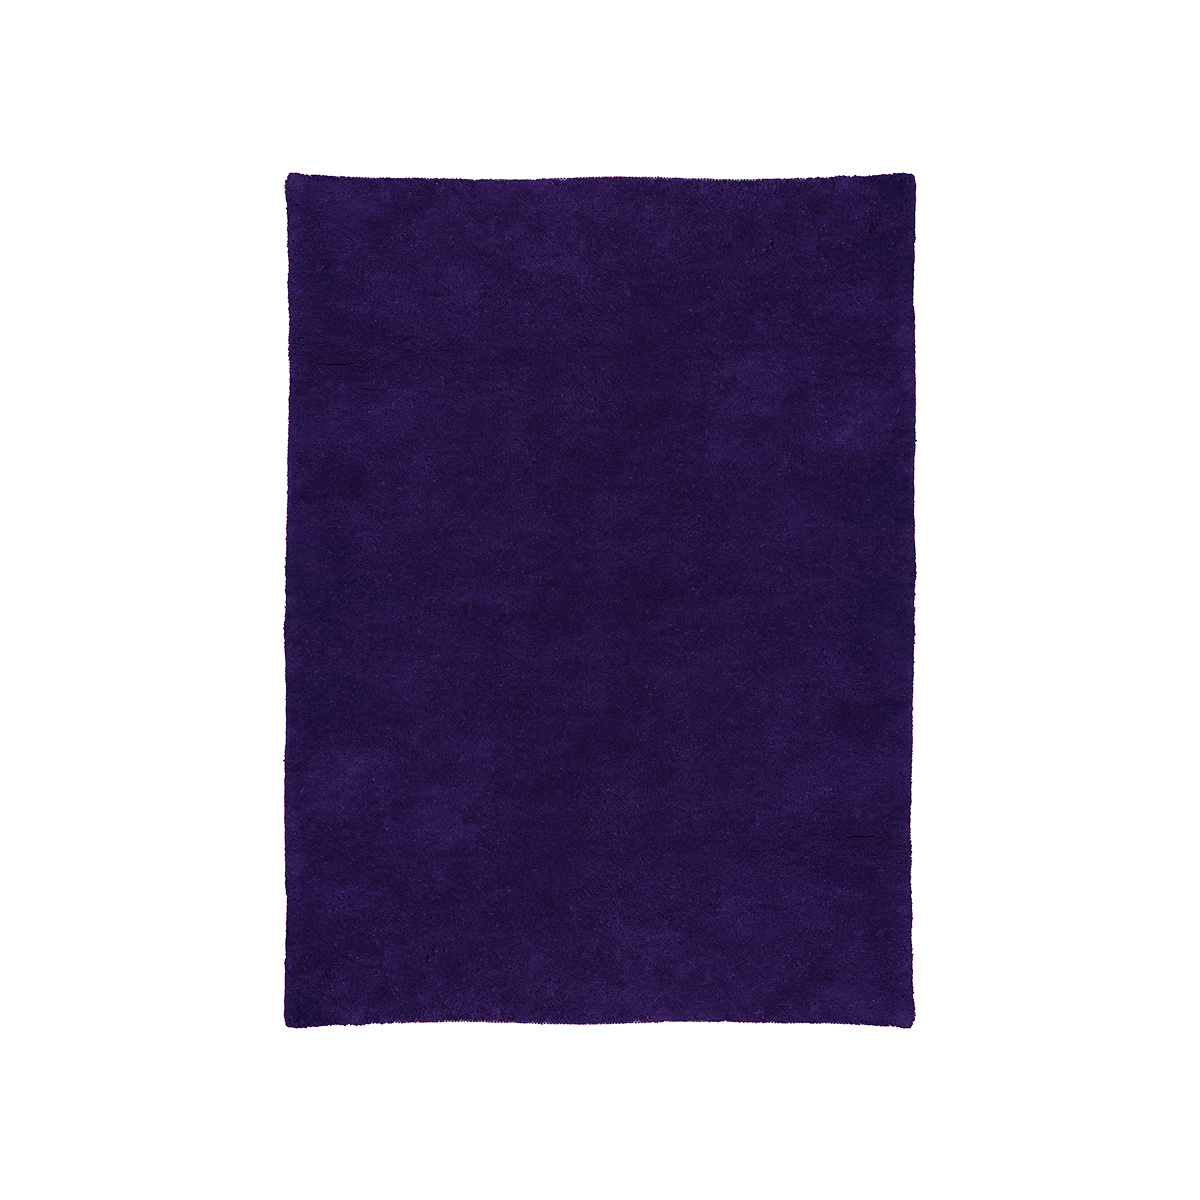 Velluto Rug, Purple 150 x 200